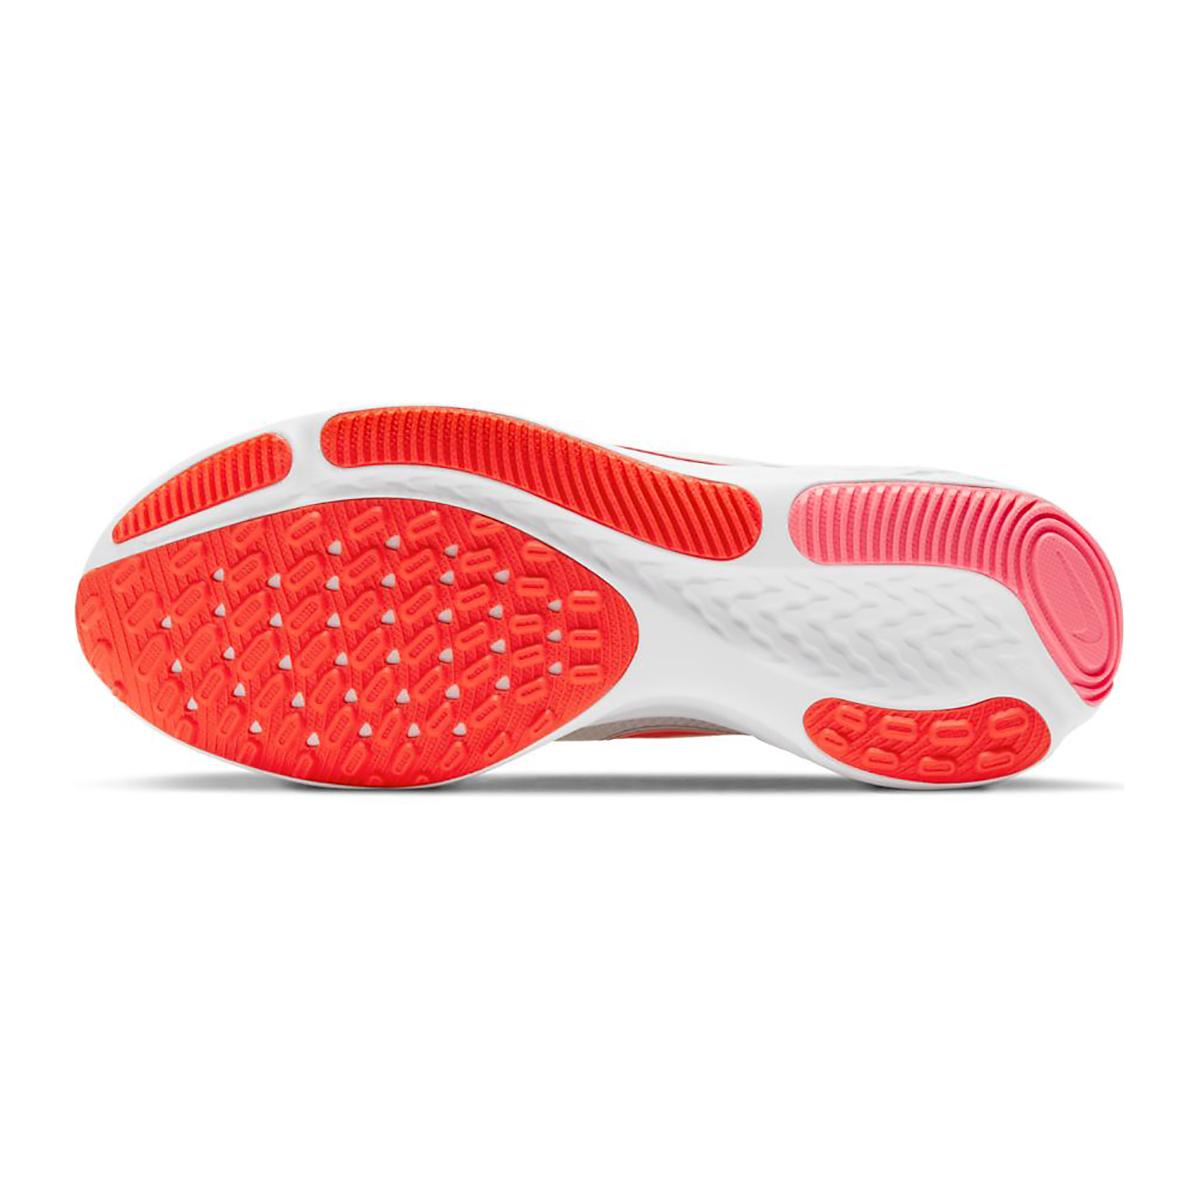 Women's Nike React Miler Running Shoe - Color: Platinum Tint/Bright Chrimson - Size: 5 - Width: Regular, Platinum Tint/Bright Chrimson, large, image 3